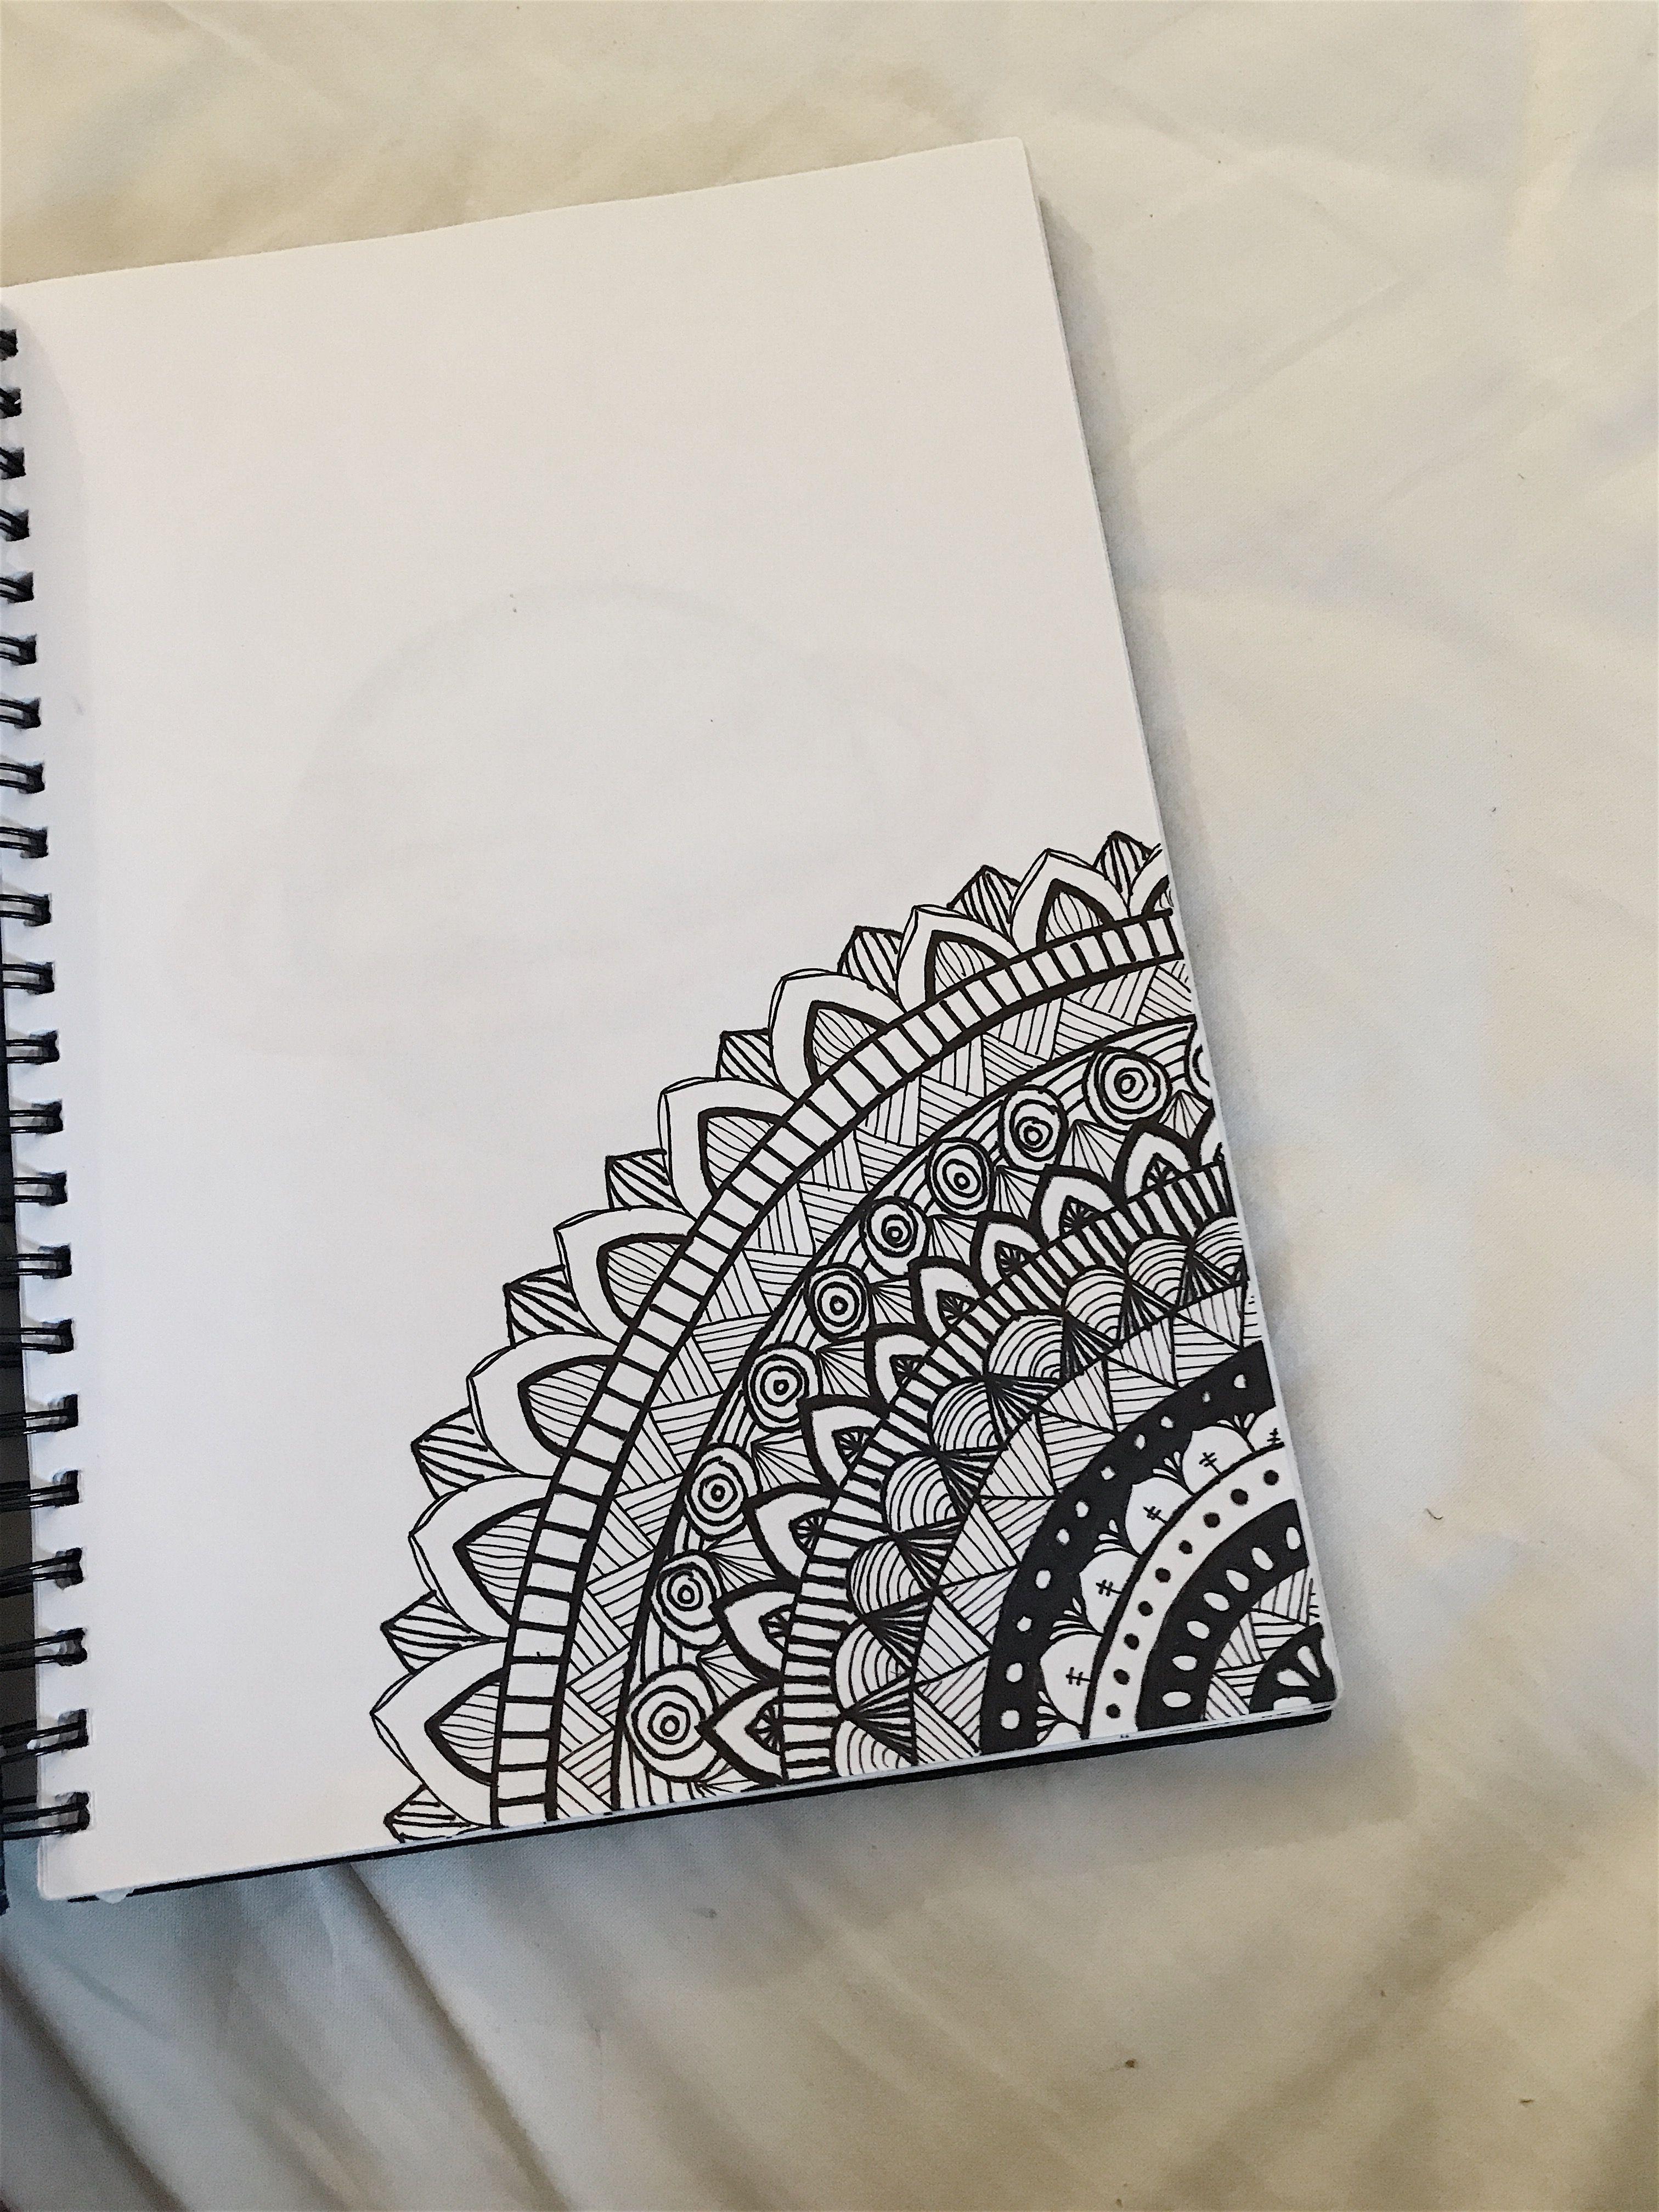 Drawing Mandala Easy Drawingtips Drawings Drawingideas Pencilartdrawings Easydrawings In 2020 Easy Mandala Drawing Mandala Drawing Mandala Art Lesson